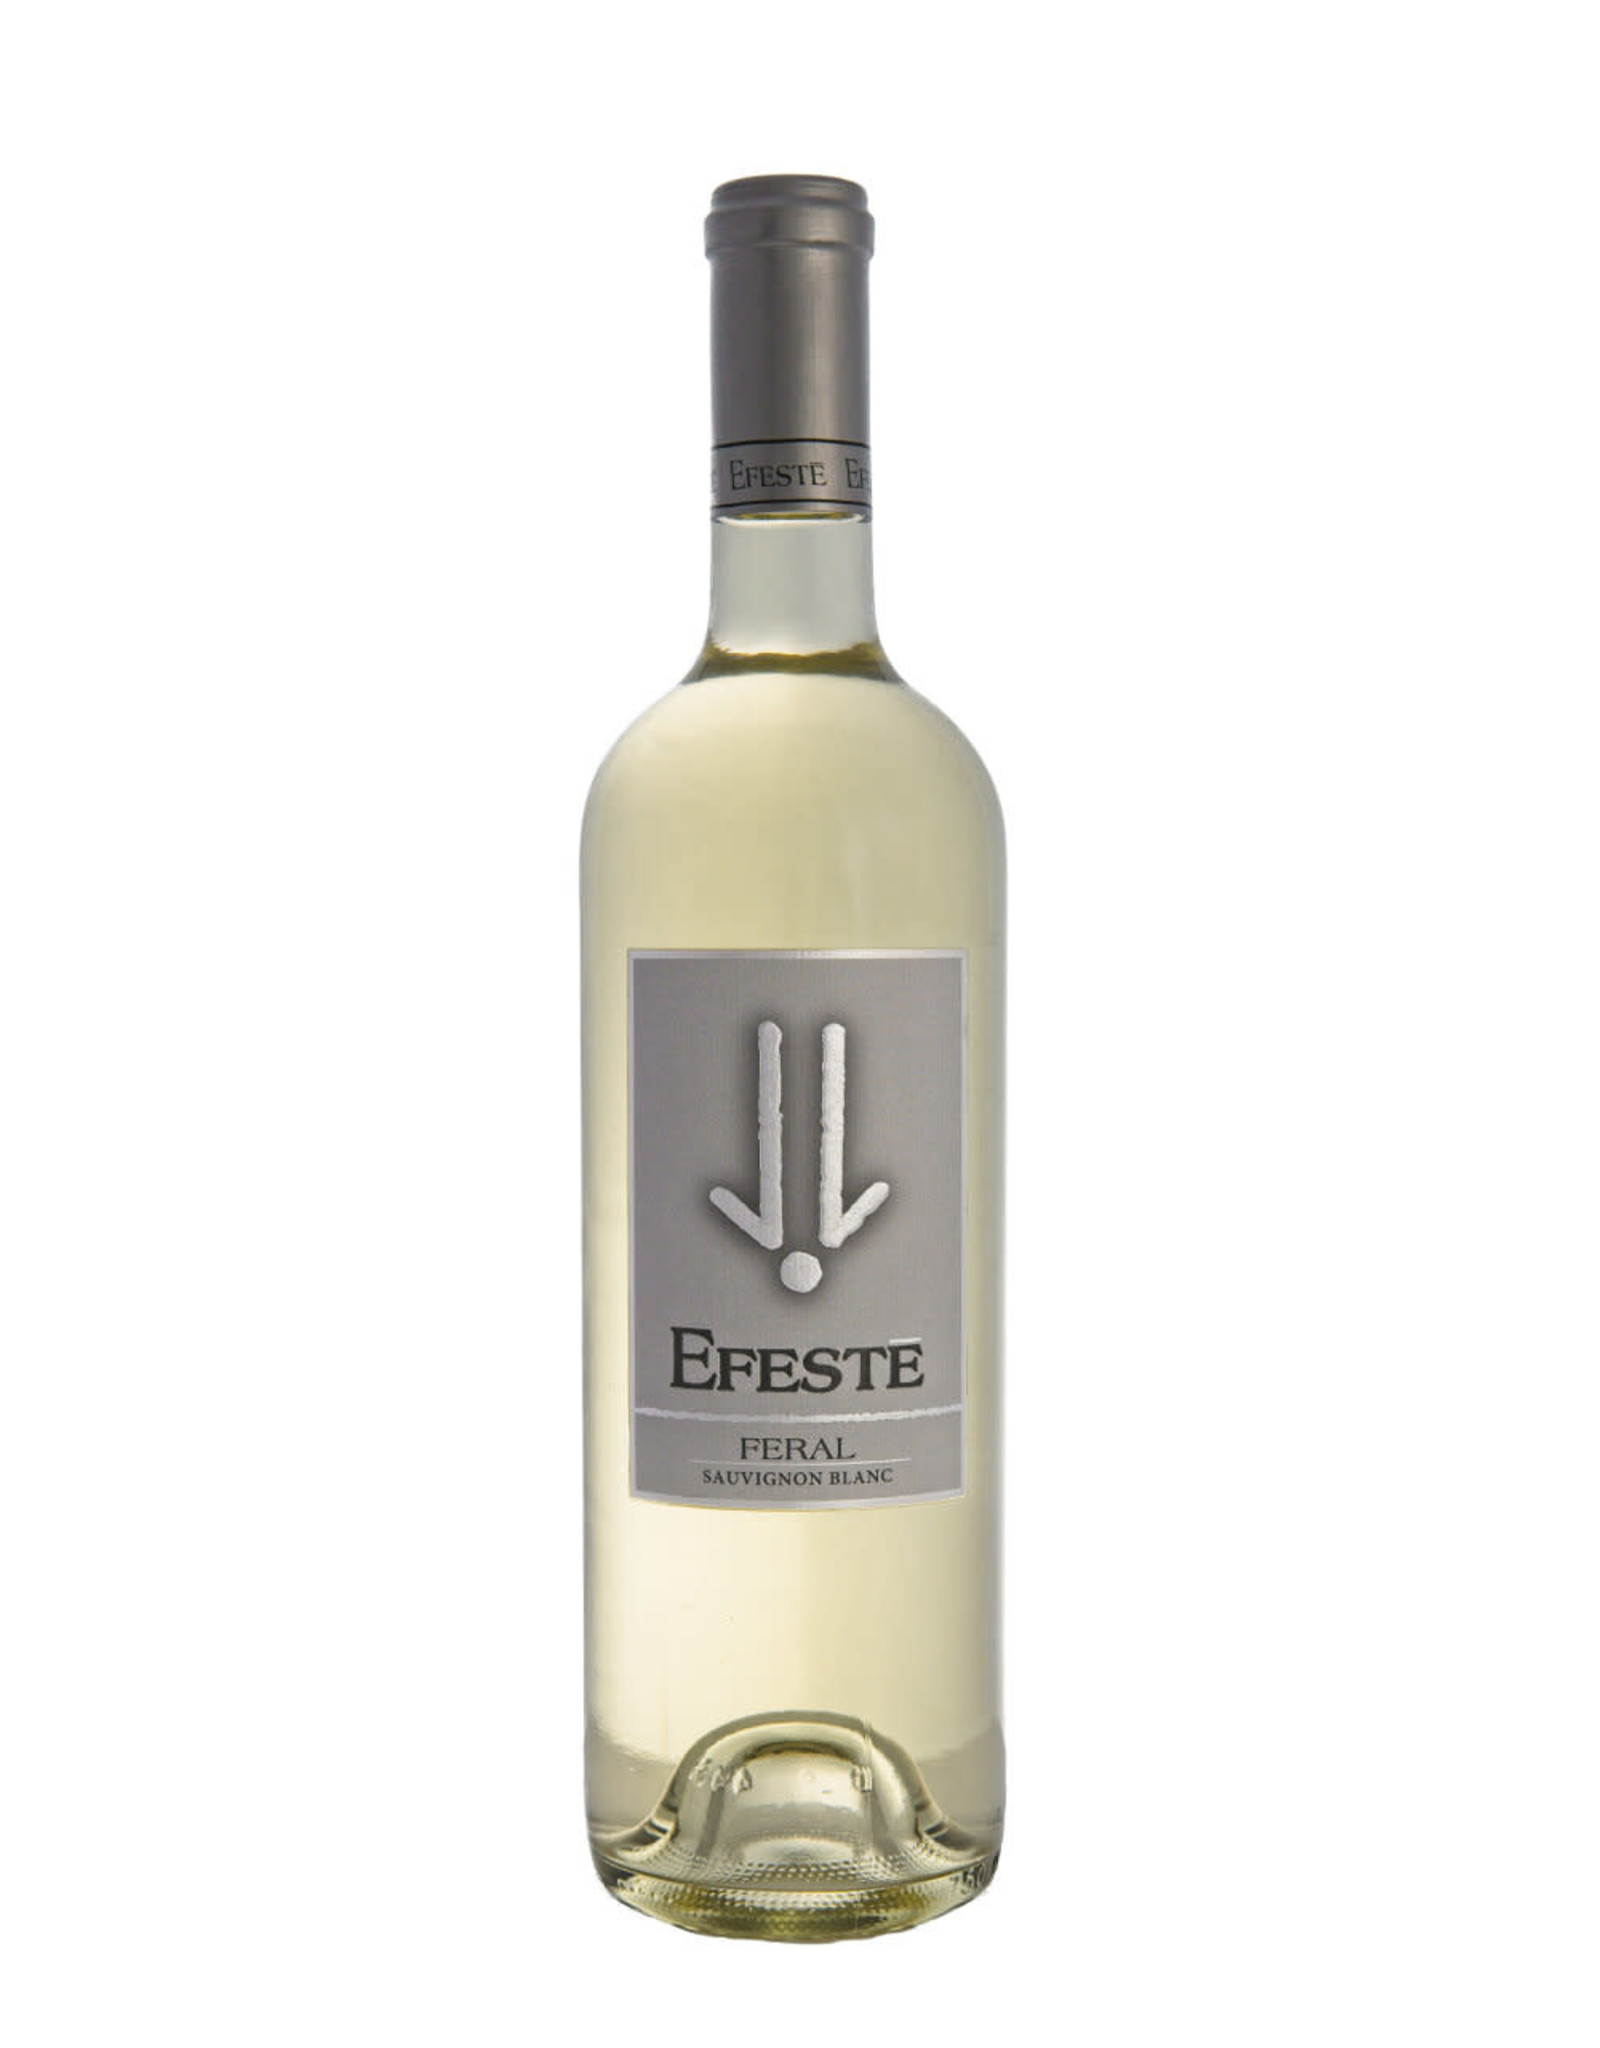 Efeste Efeste Feral Evergreen Vineyard Sauvignon Blanc, Ancient Lakes of Columbia Valley 2019